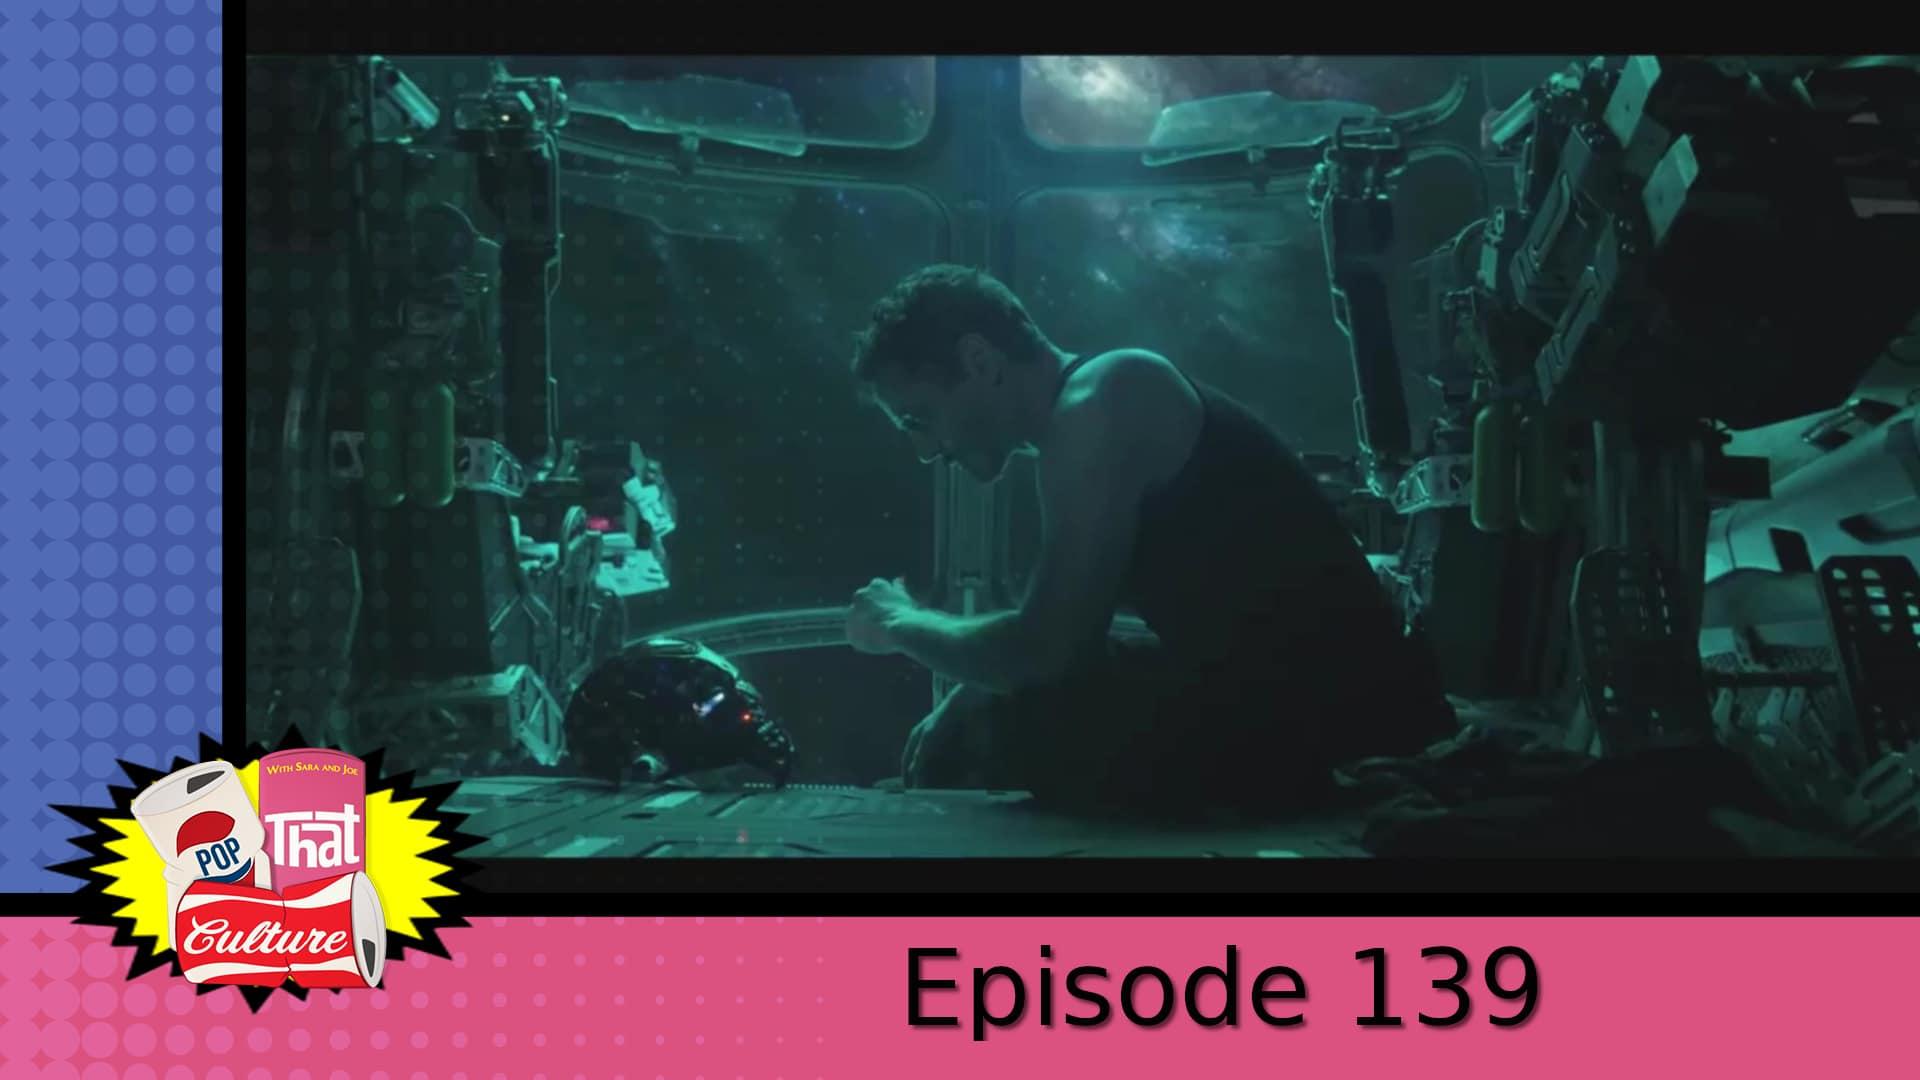 Pop That Culture - Episode 139